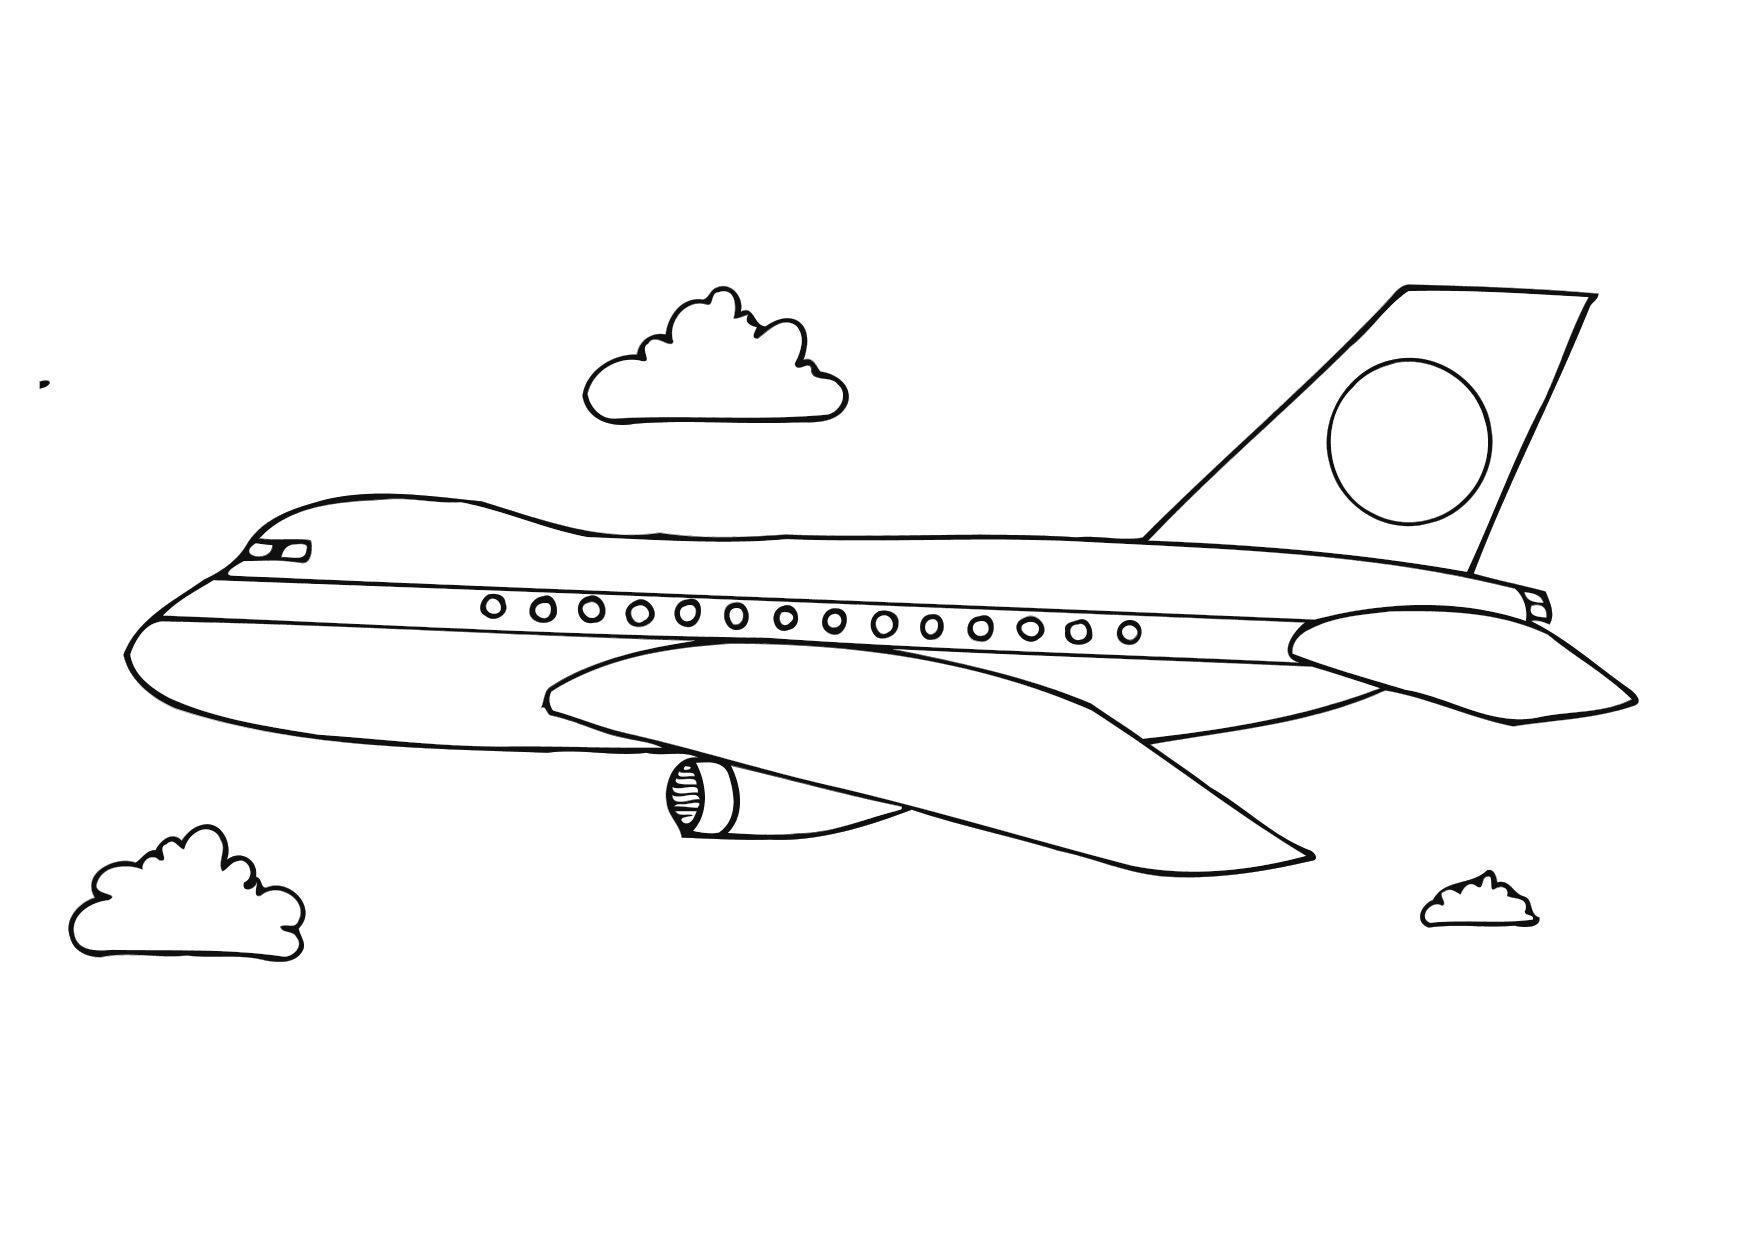 Coloring Page Aeroplane